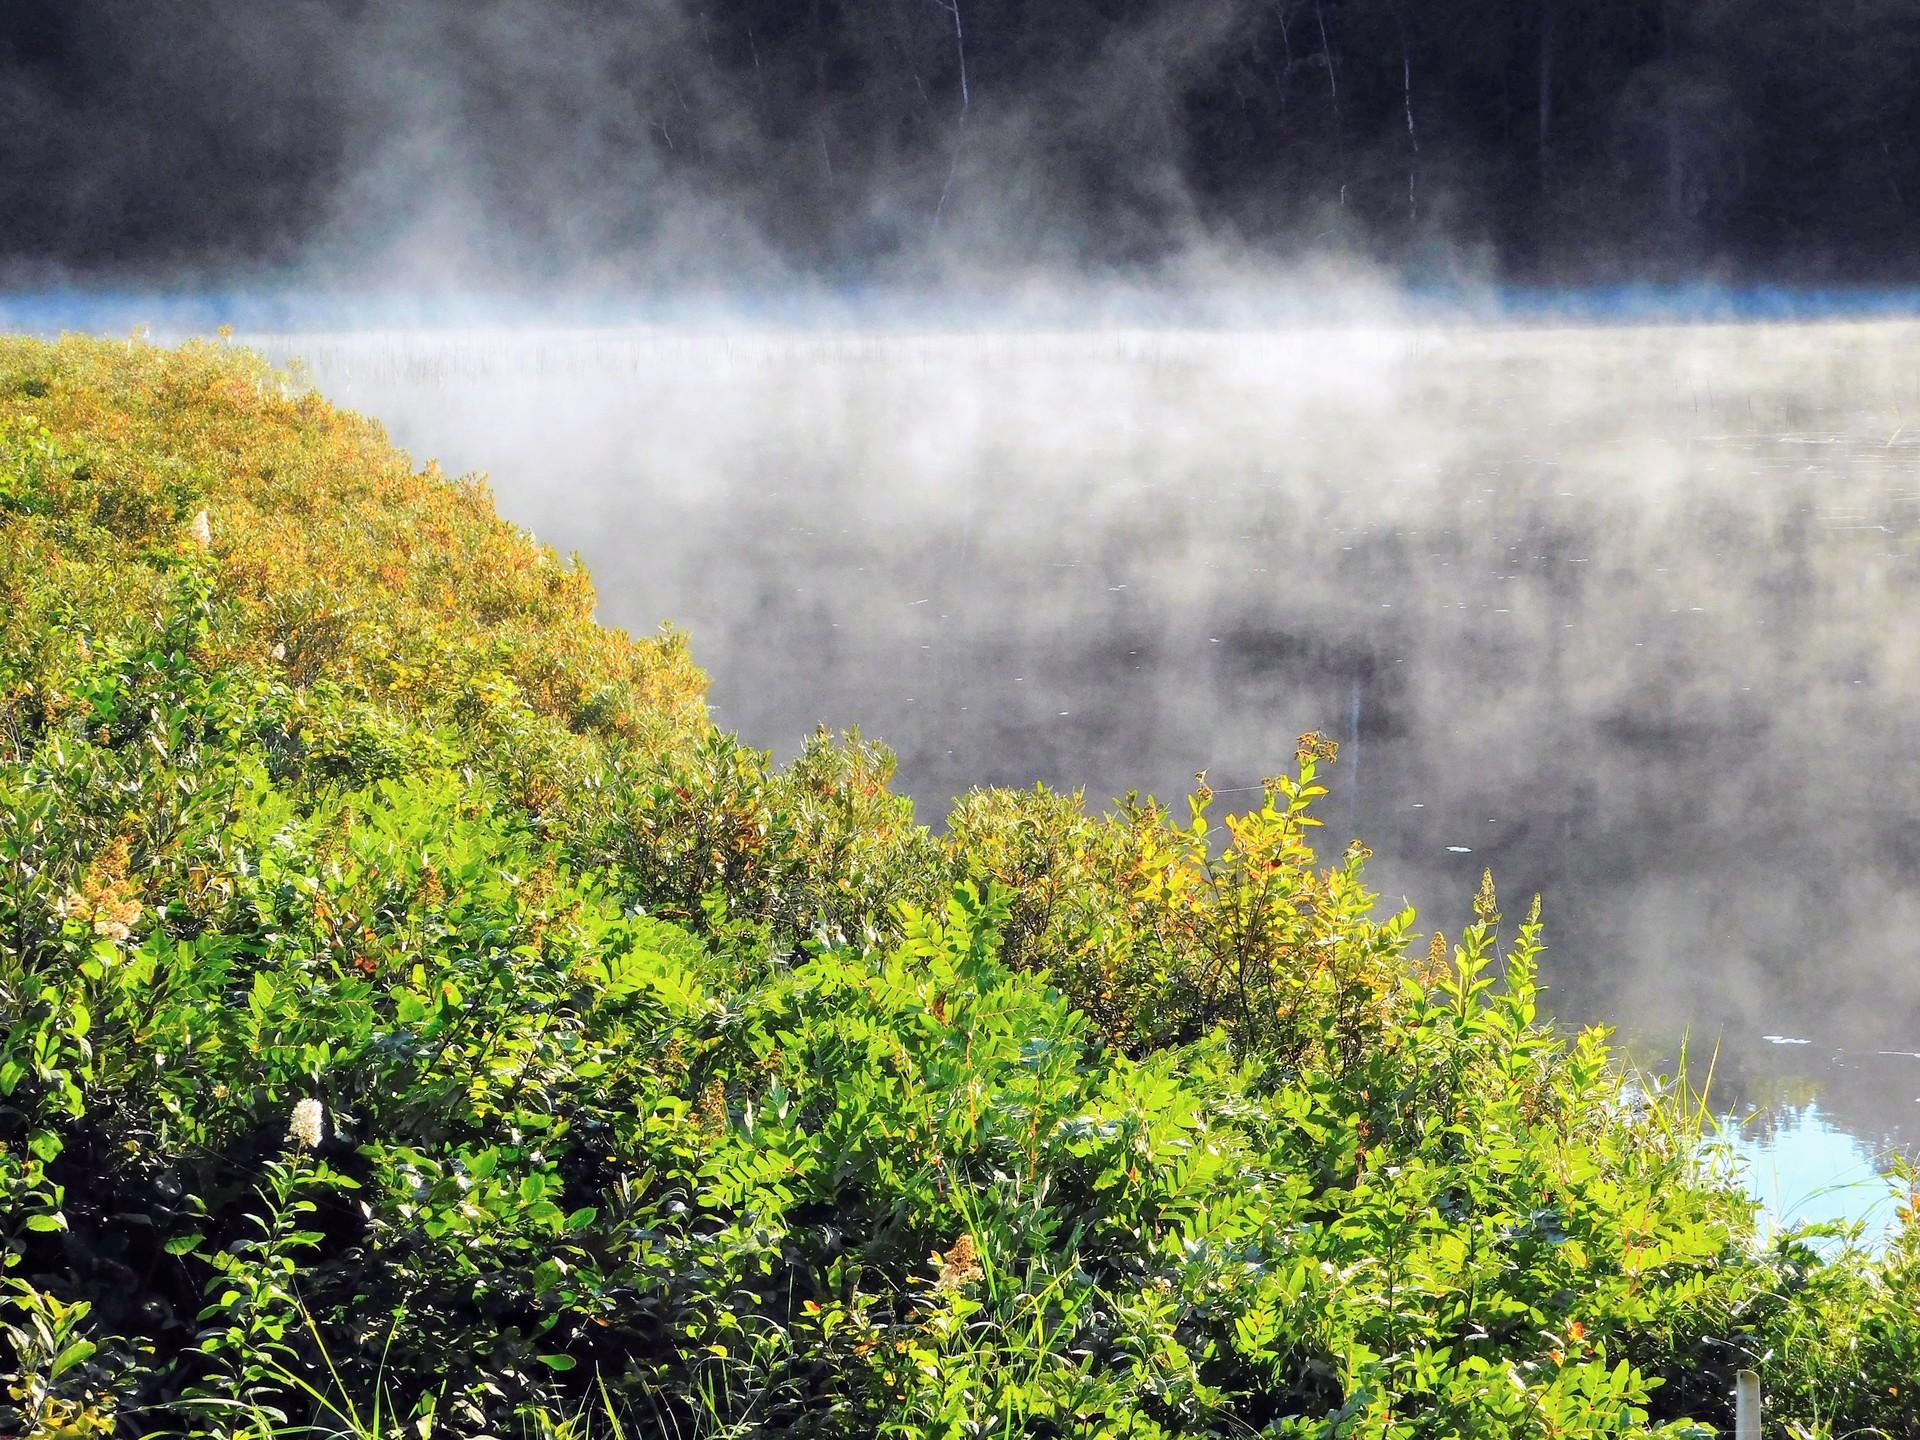 Foggy Morning | rick.cognyl.fournier, daylight, environment, fog